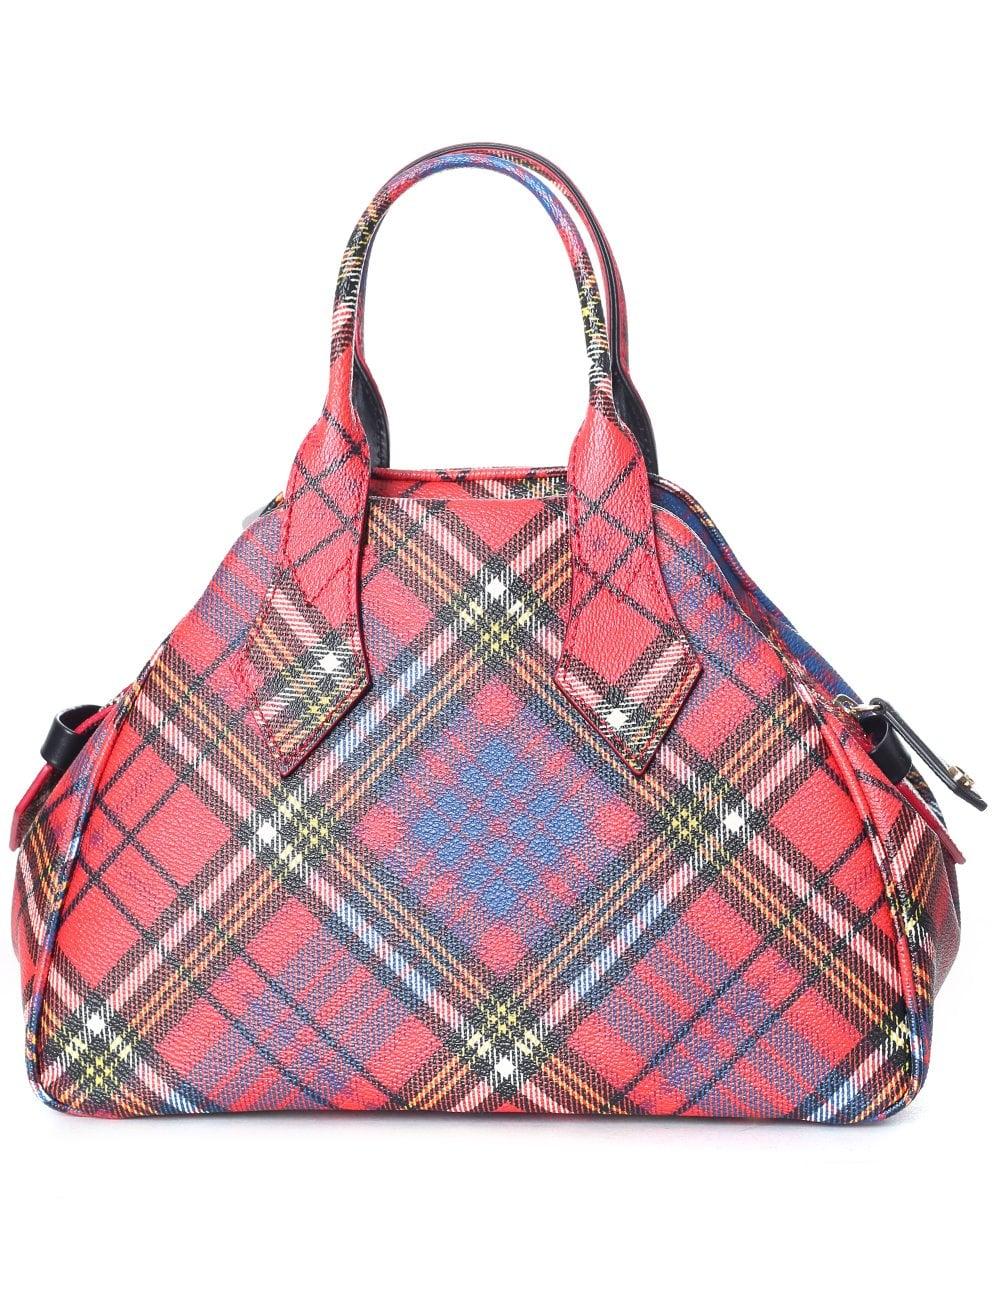 ce57f9960478e Vivienne Westwood Women's Medium Yasmine Bag